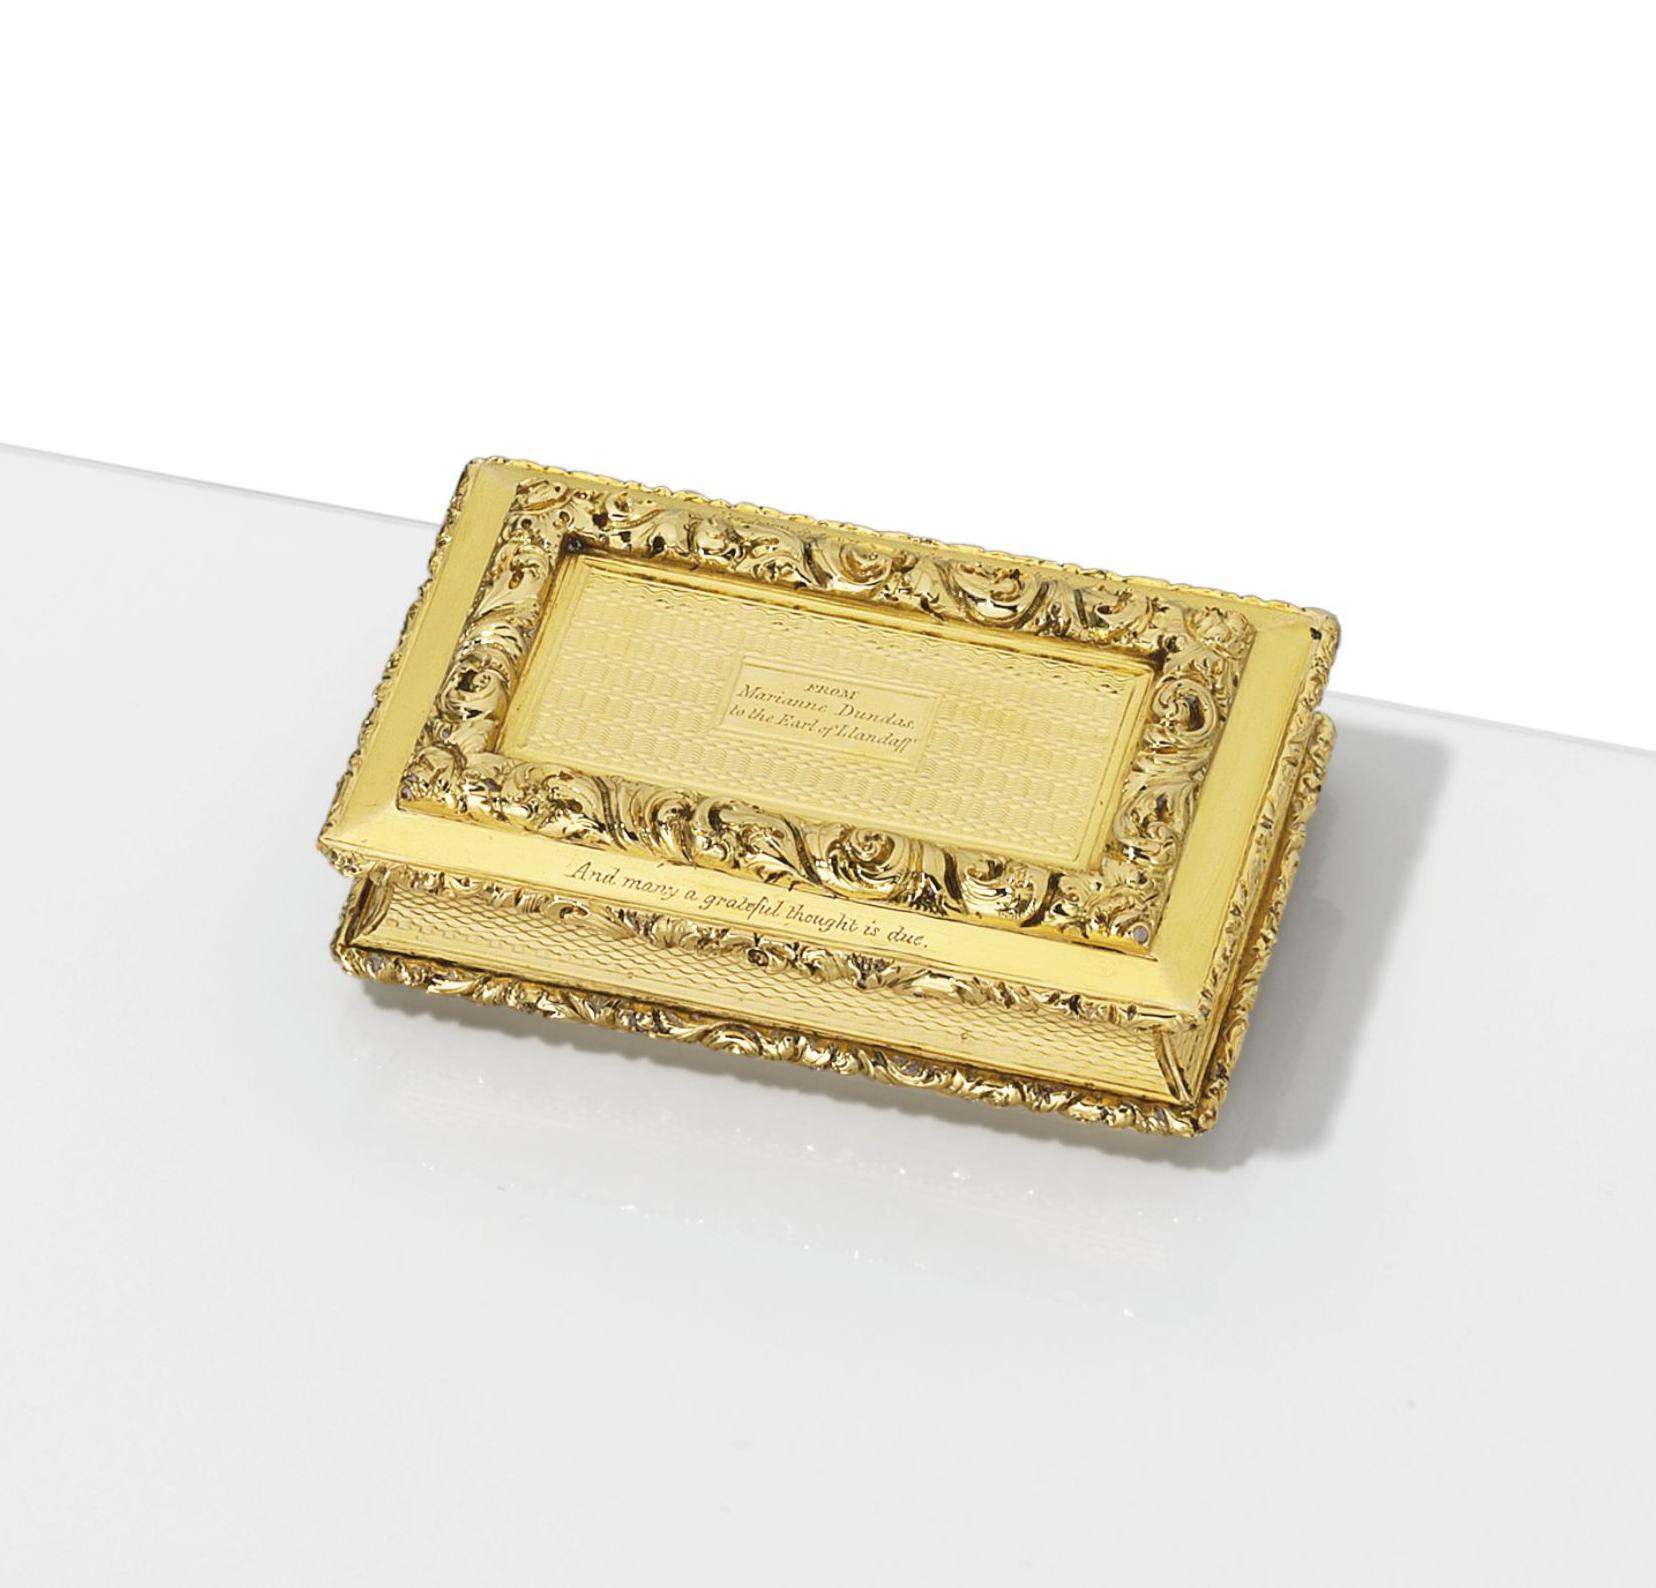 A GEORGE IV GOLD SNUFF-BOX